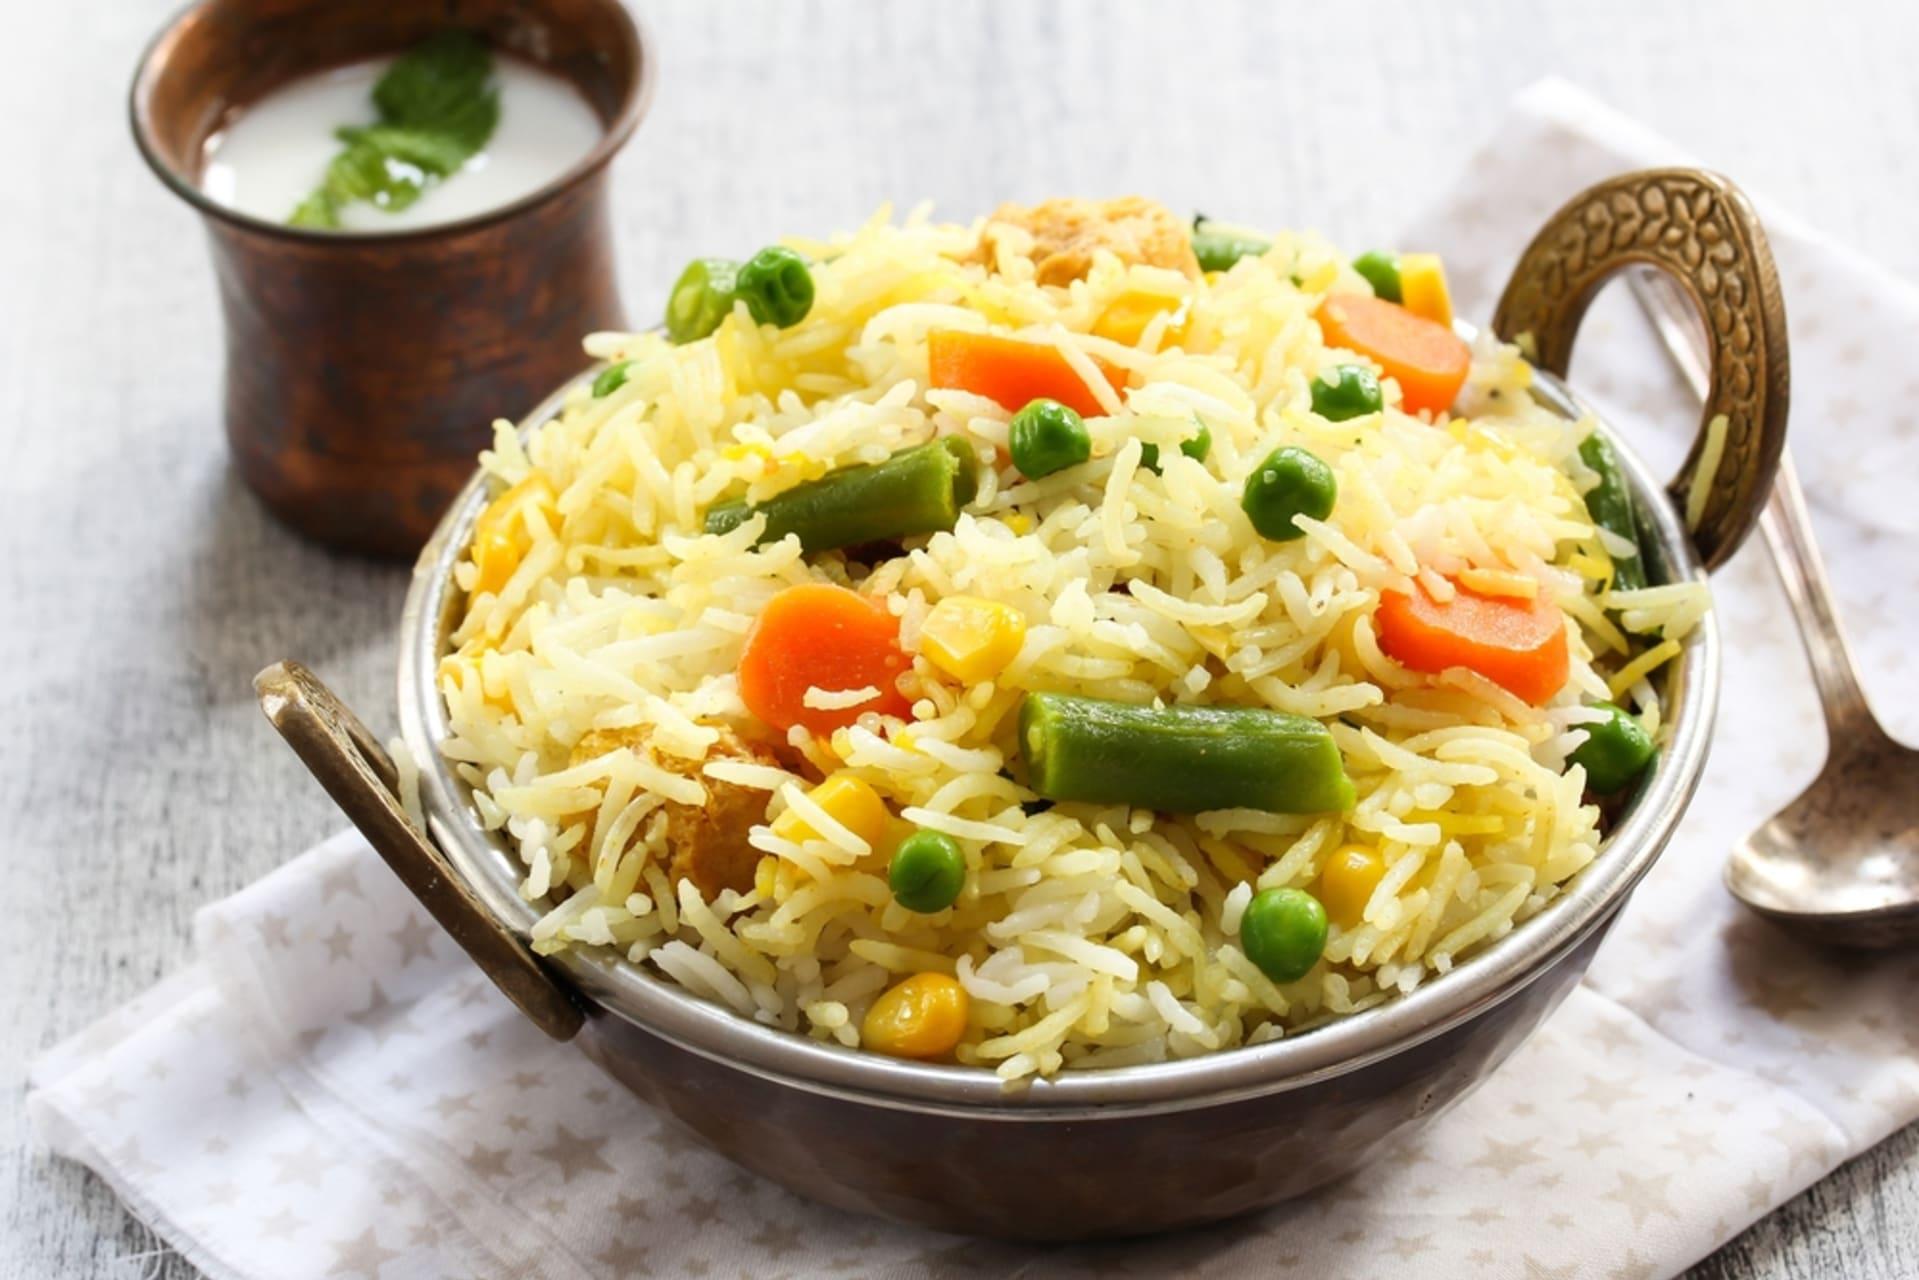 Delhi - A Bowl of Indian styled Vegetarian Pulao ( rice) with Raita